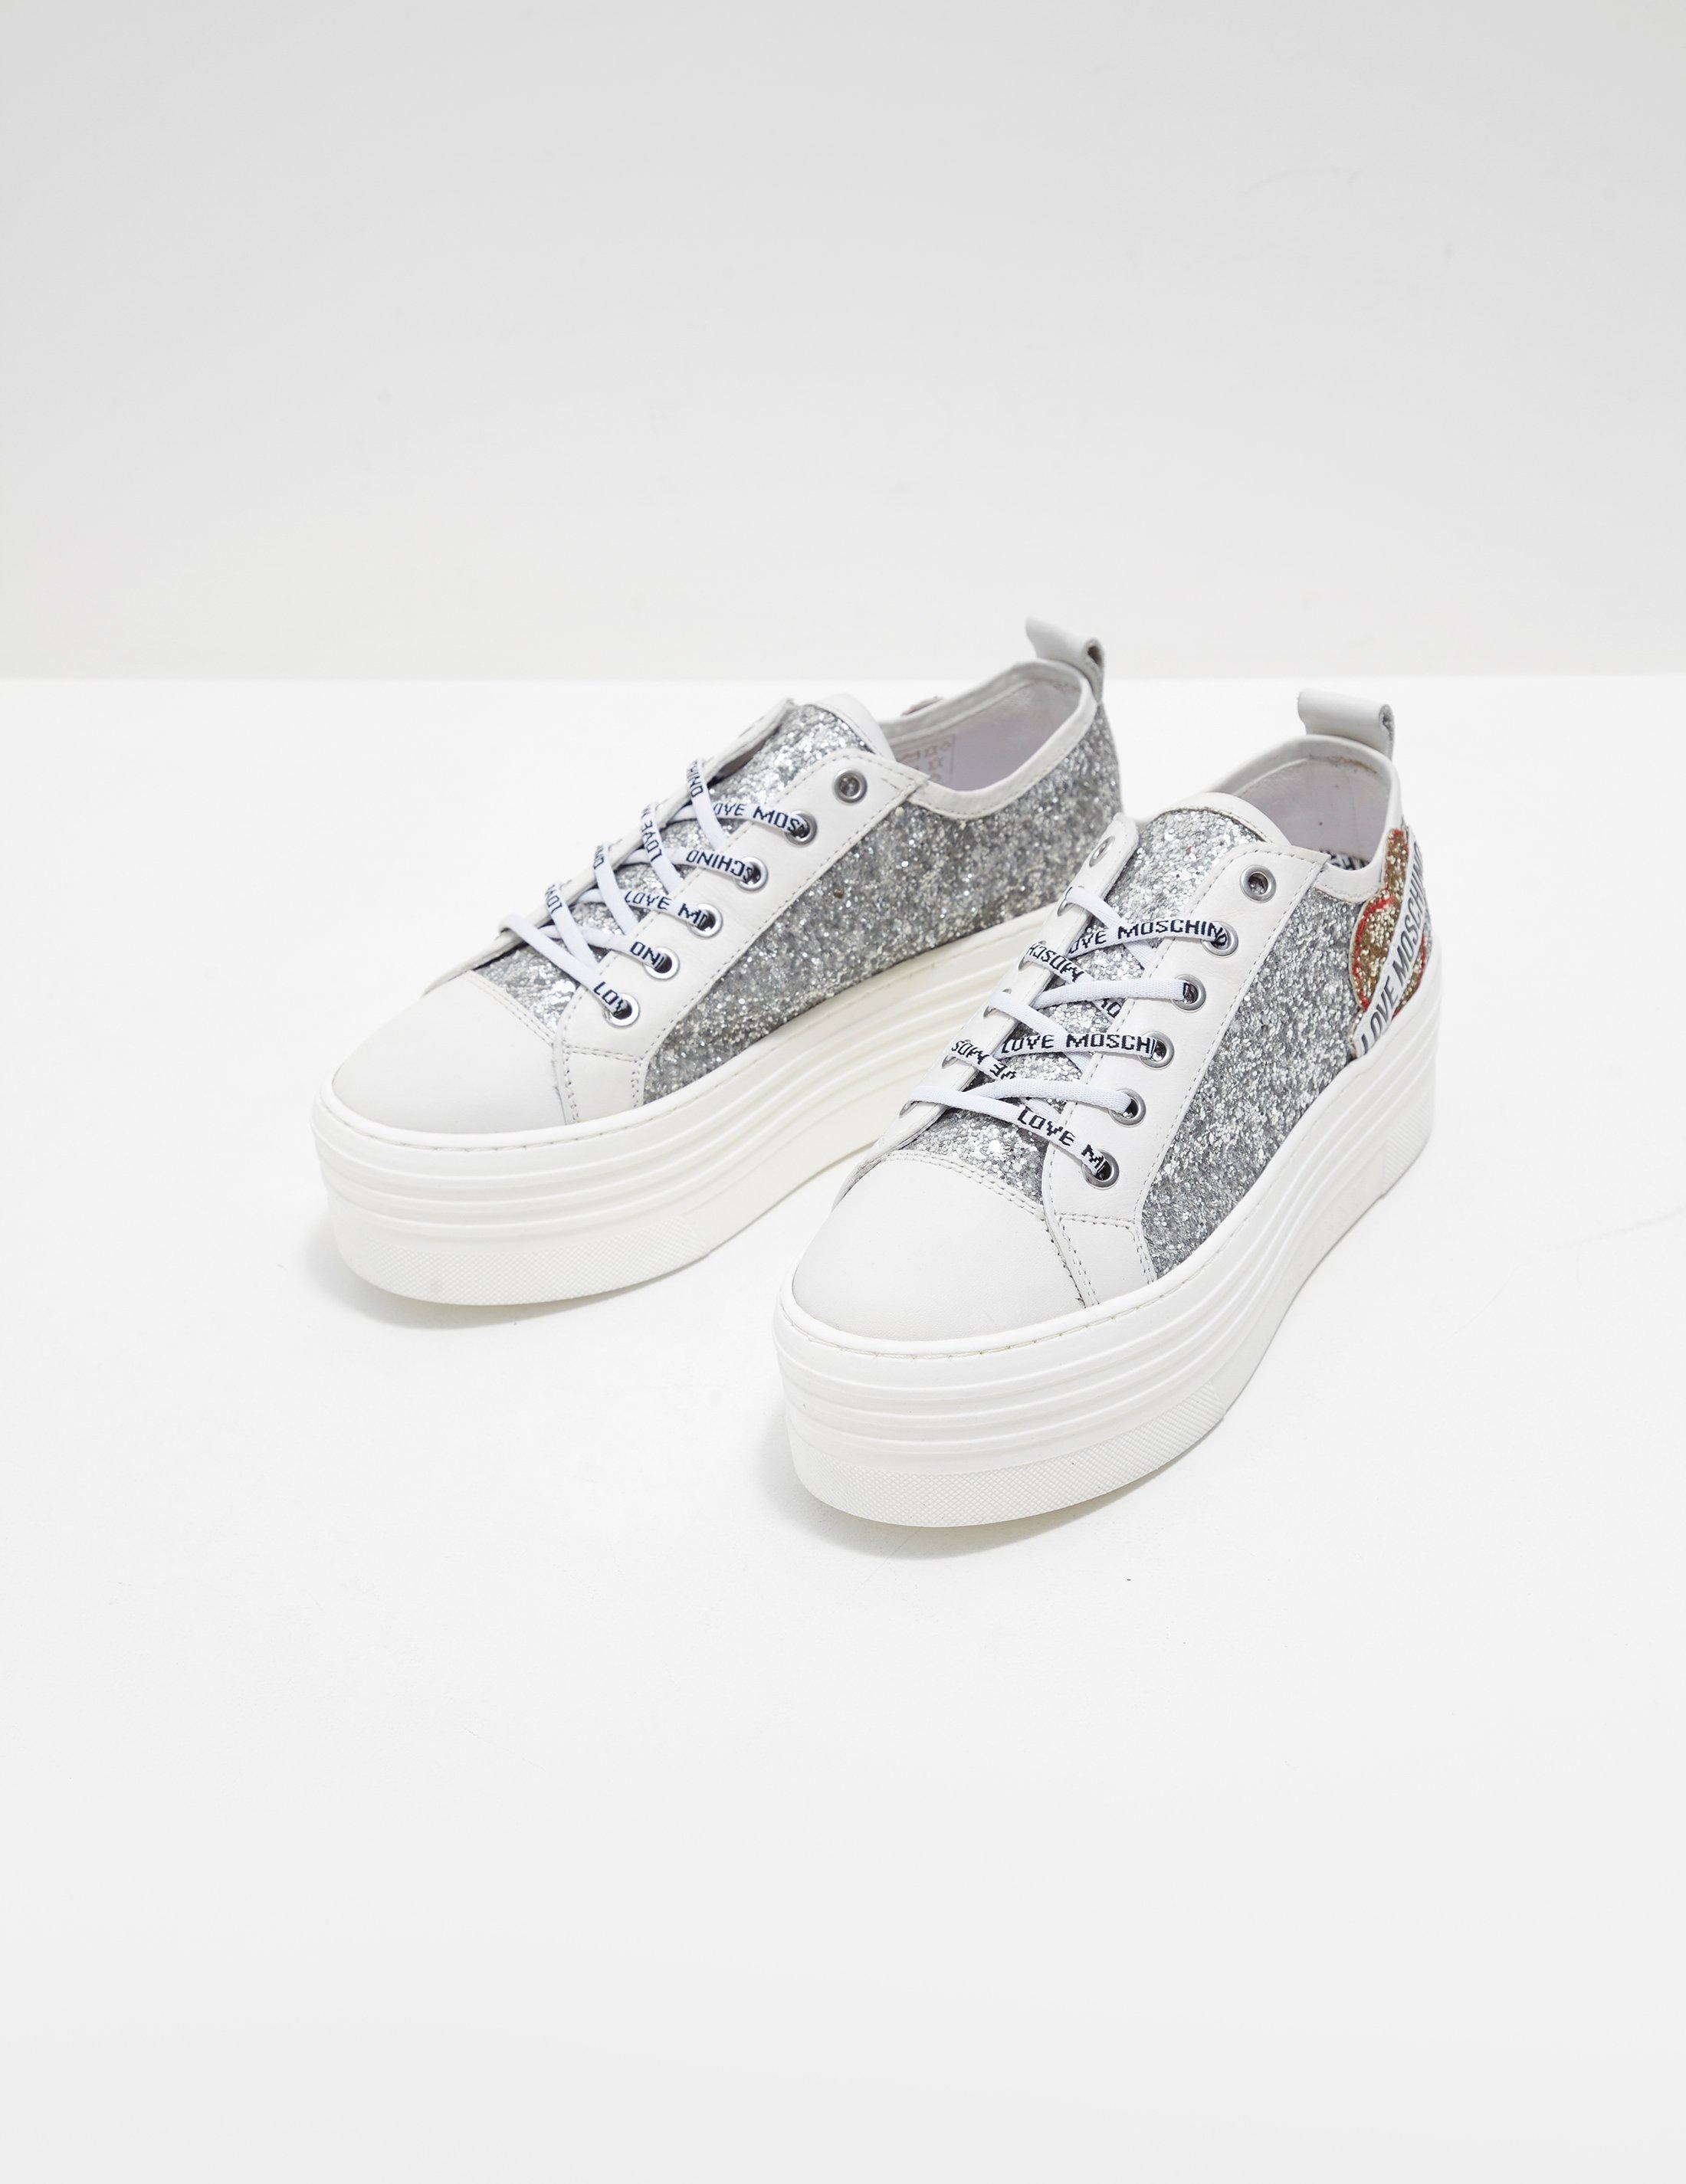 2b1c3001d7b1 Lyst - Love Moschino Womens Glitter Platform Trainers Silver in Metallic